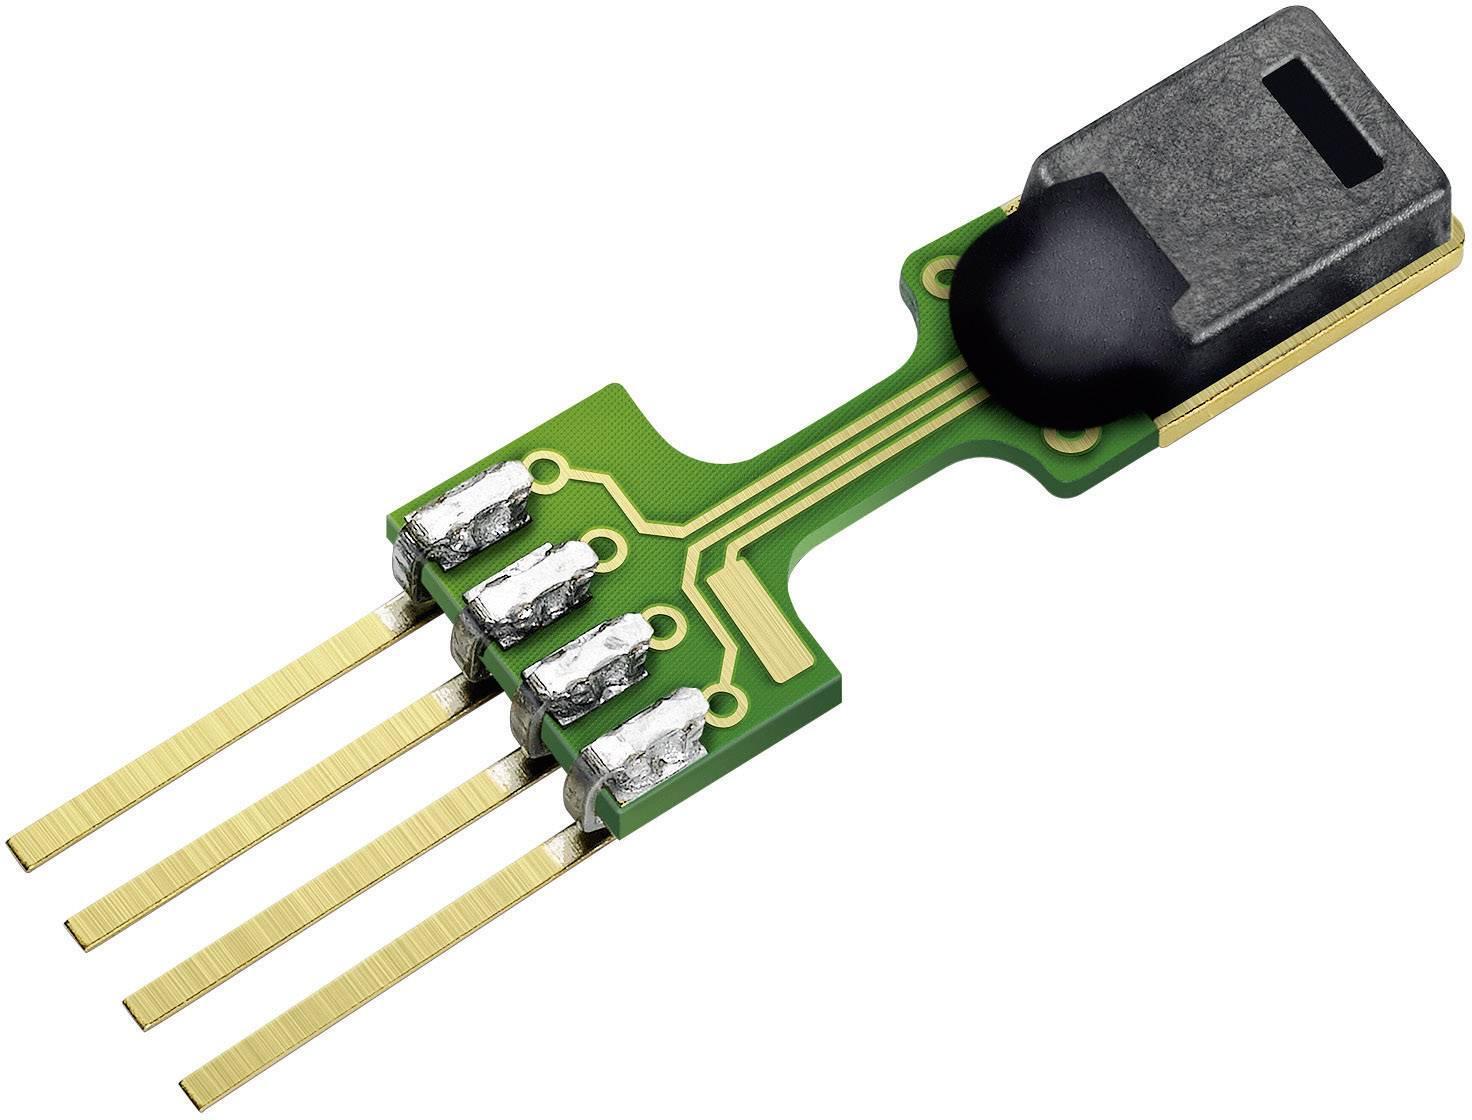 Senzor vlhkosti a teplotní senzor Sensirion SHT75, 0 - 100 % r., -40 - +125 °C